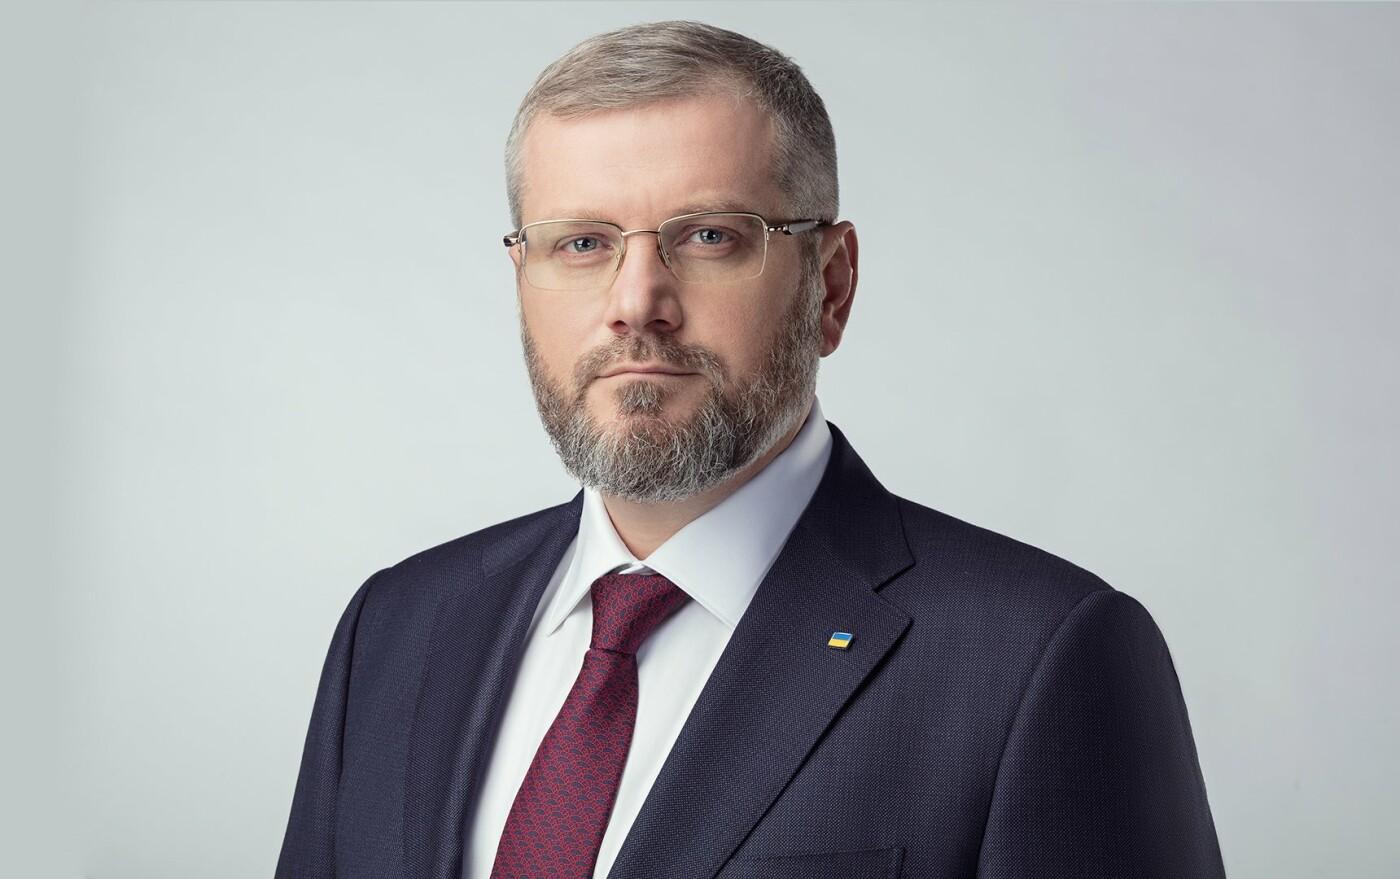 Вилкул: В Украине по итогам 2017 рекордная за 15 лет безработица, фото-1